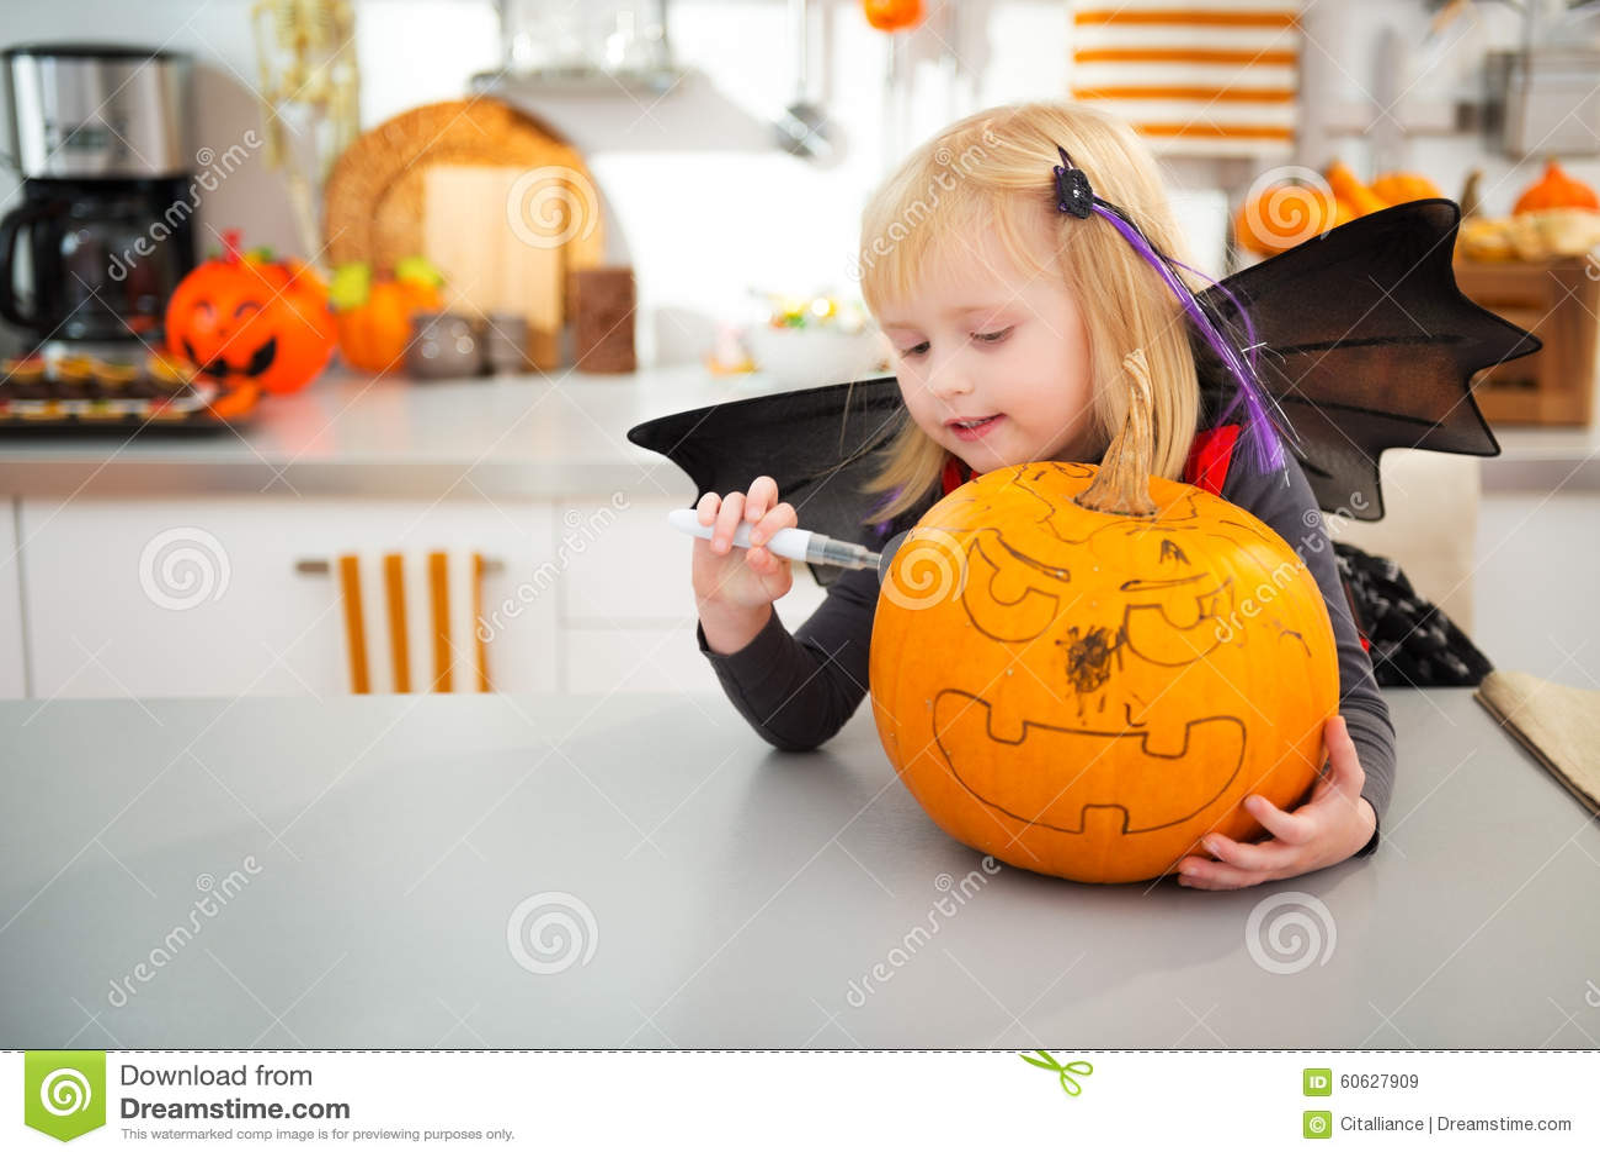 kitchen lanterns fluorescent light fixture 万圣夜打扮了创造大南瓜杰克o灯笼的女孩库存图片 图片包括有现代 厨房 微笑的万圣夜打扮了创造大橙色南瓜杰克o灯笼的女孩在装饰的厨房传统秋天假日